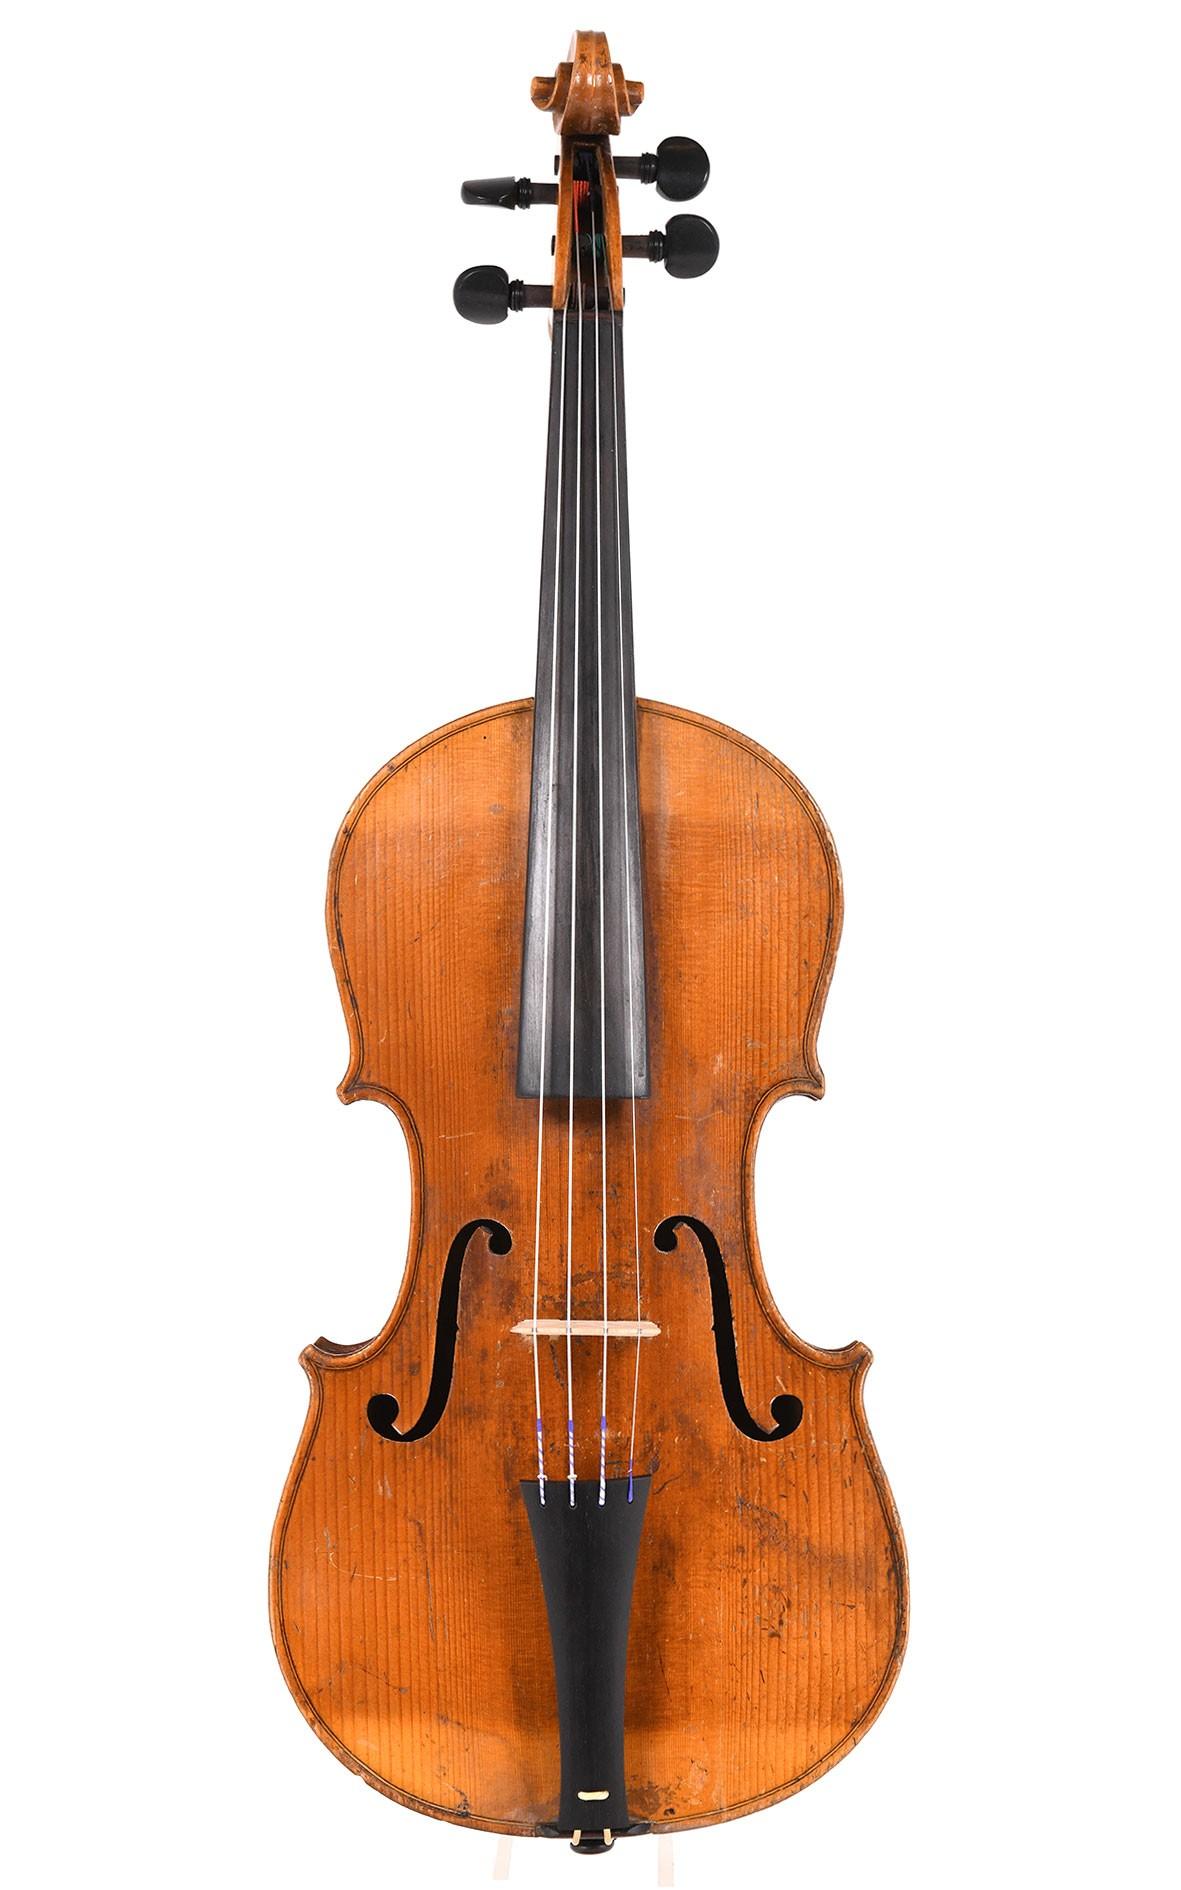 Baroque violin - Markneukirchen, circa 1800